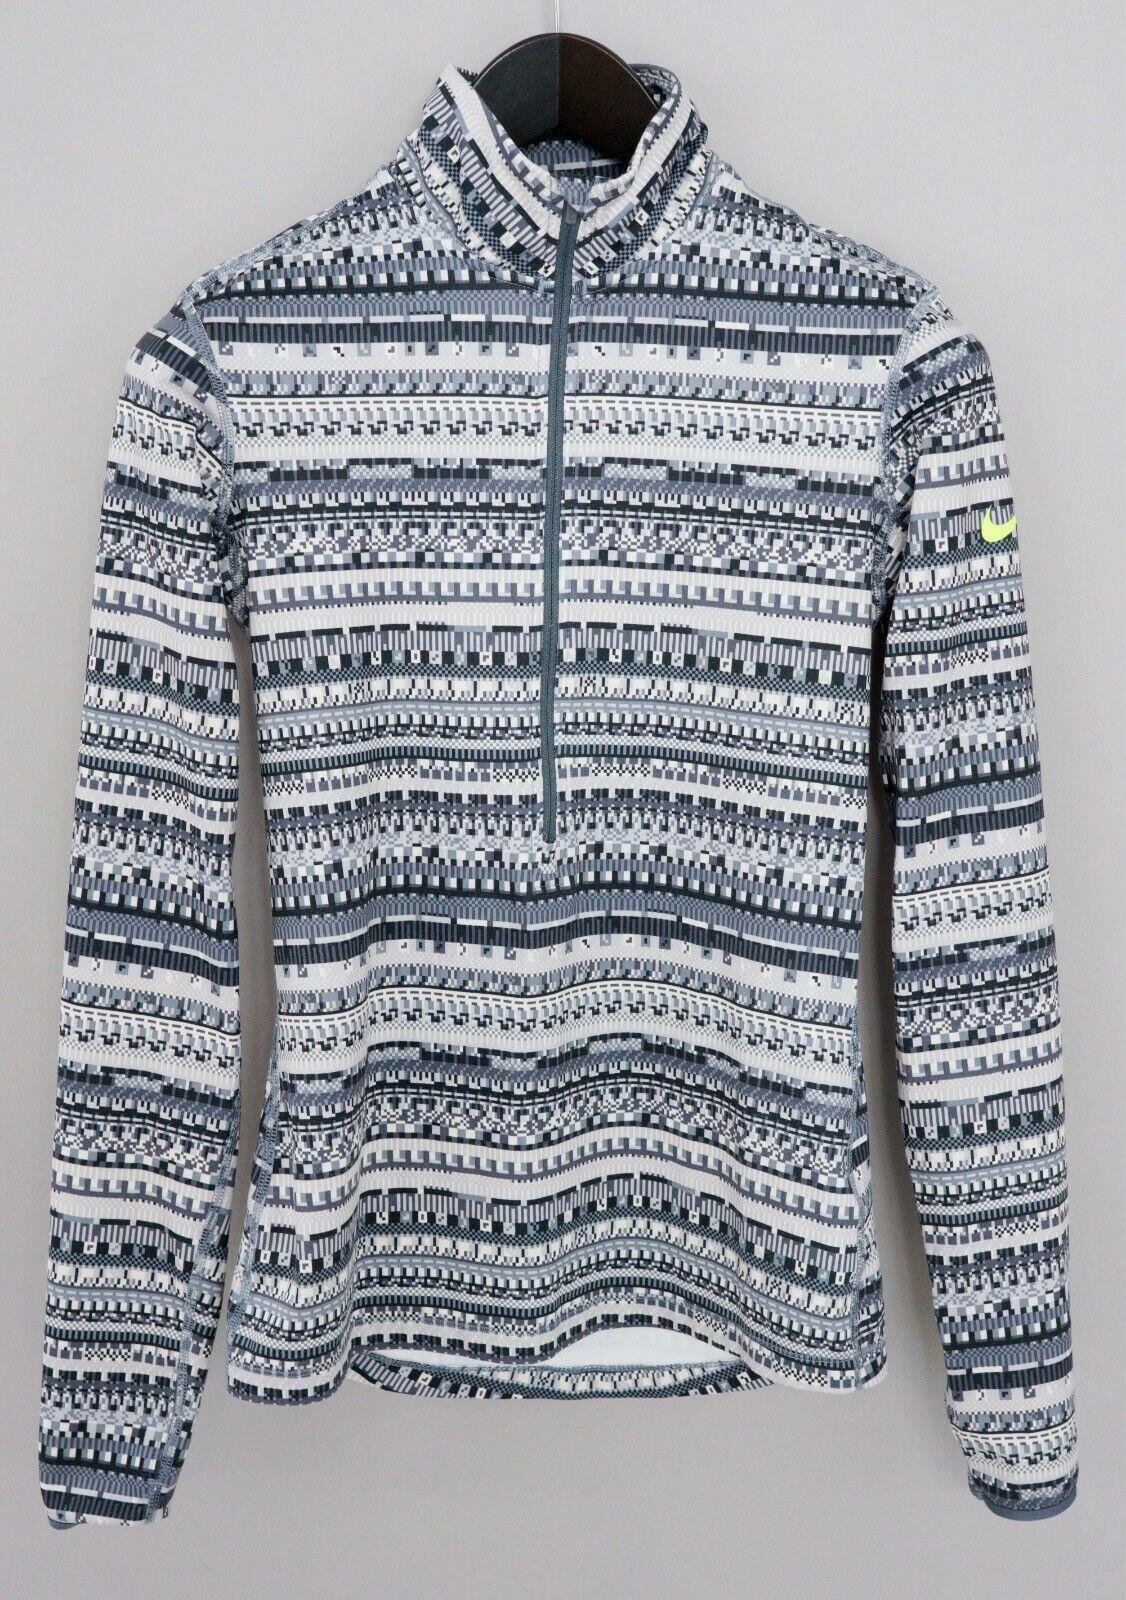 Details about Women Nike Sweatshirt Pro Dri Fit Activewear Stretch Half Zip S XMM680